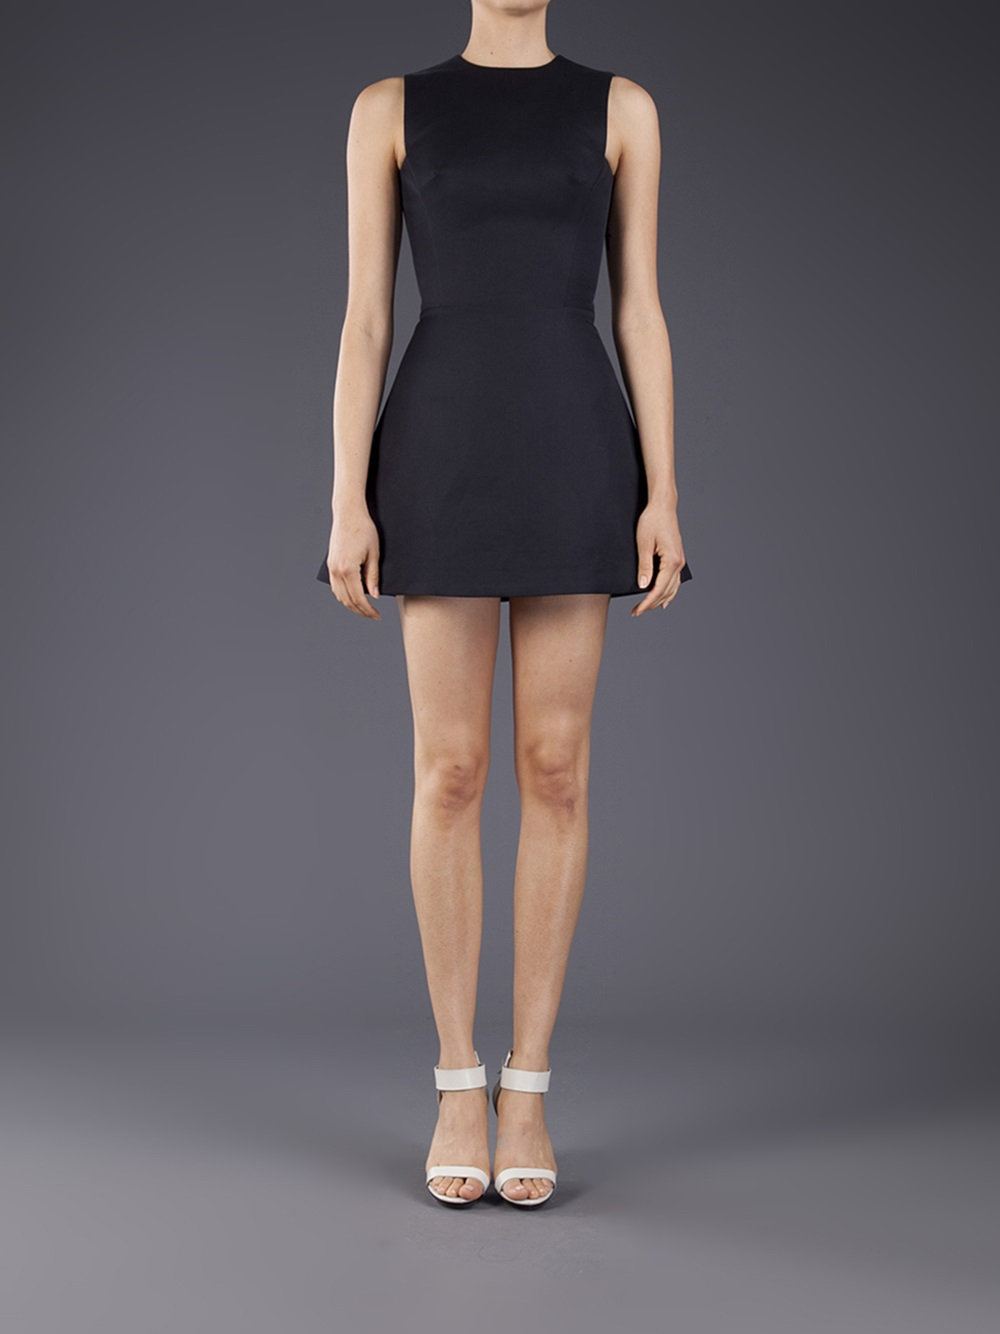 Victoria Beckham Aline Mini Dress In Black Lyst